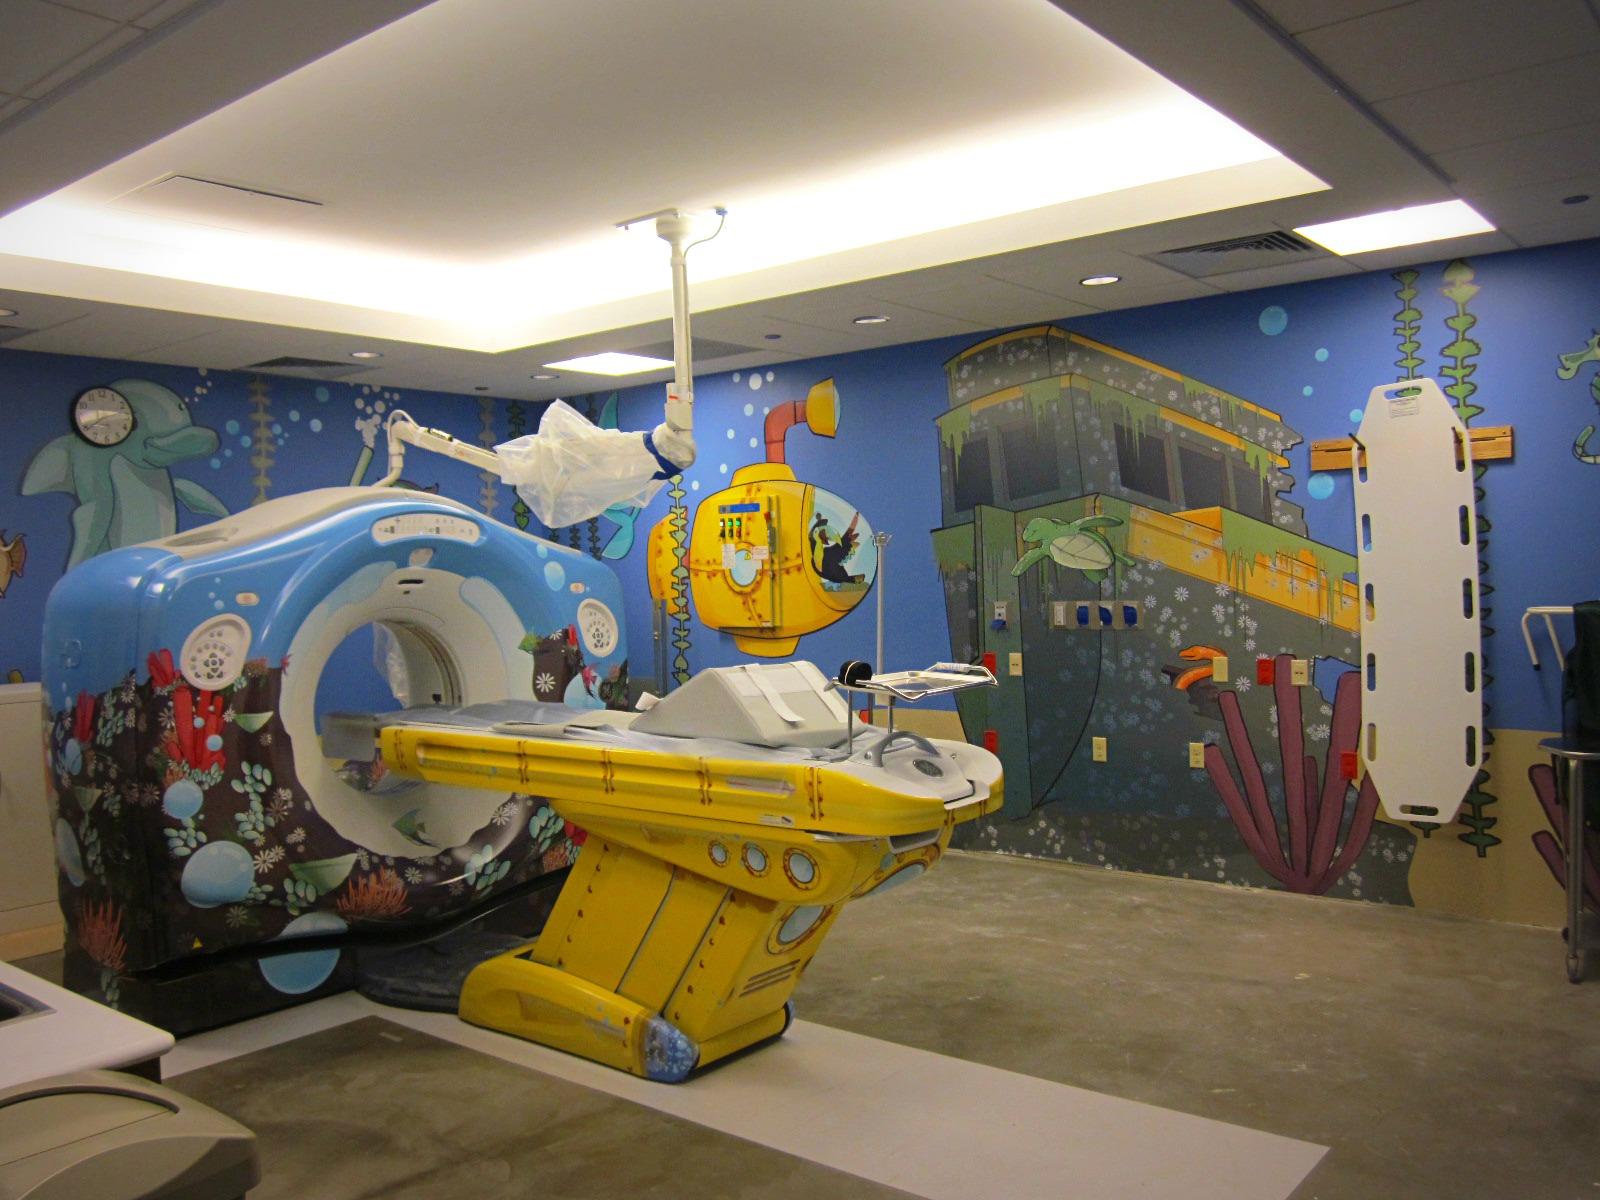 kosair childrens hospital images - HD1600×1200